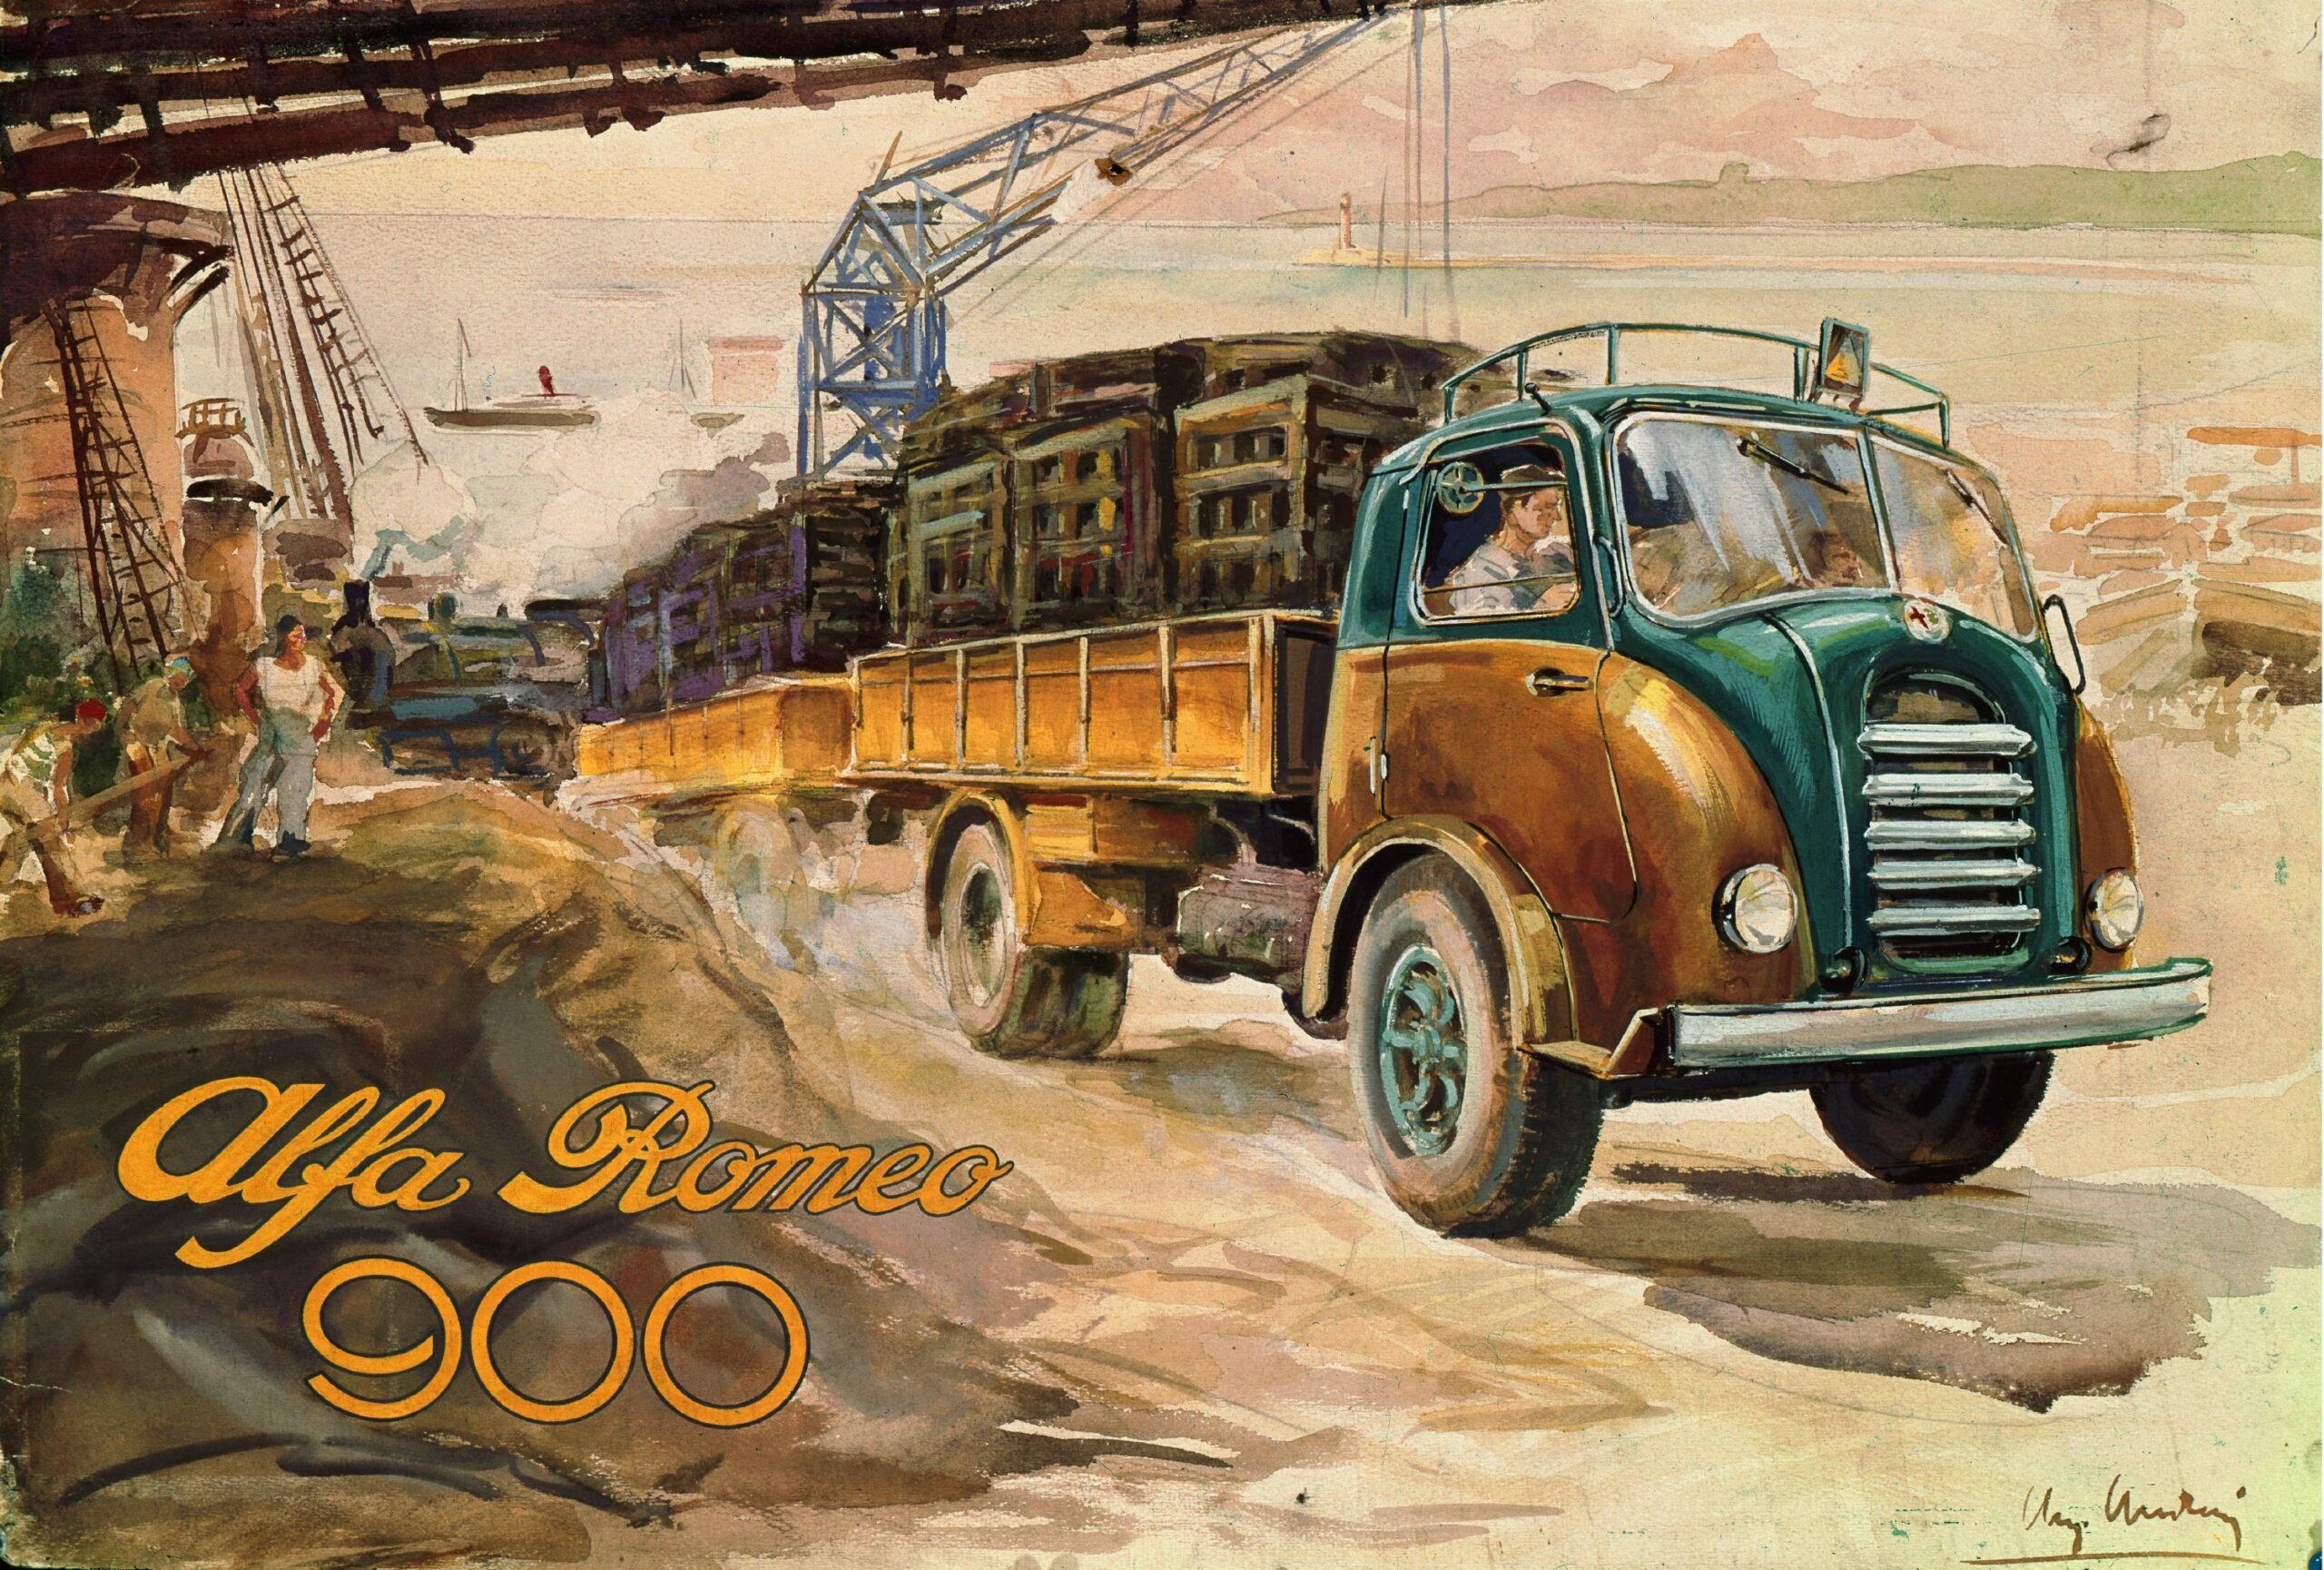 The 1947 Alfa Romeo 900 commercial truck